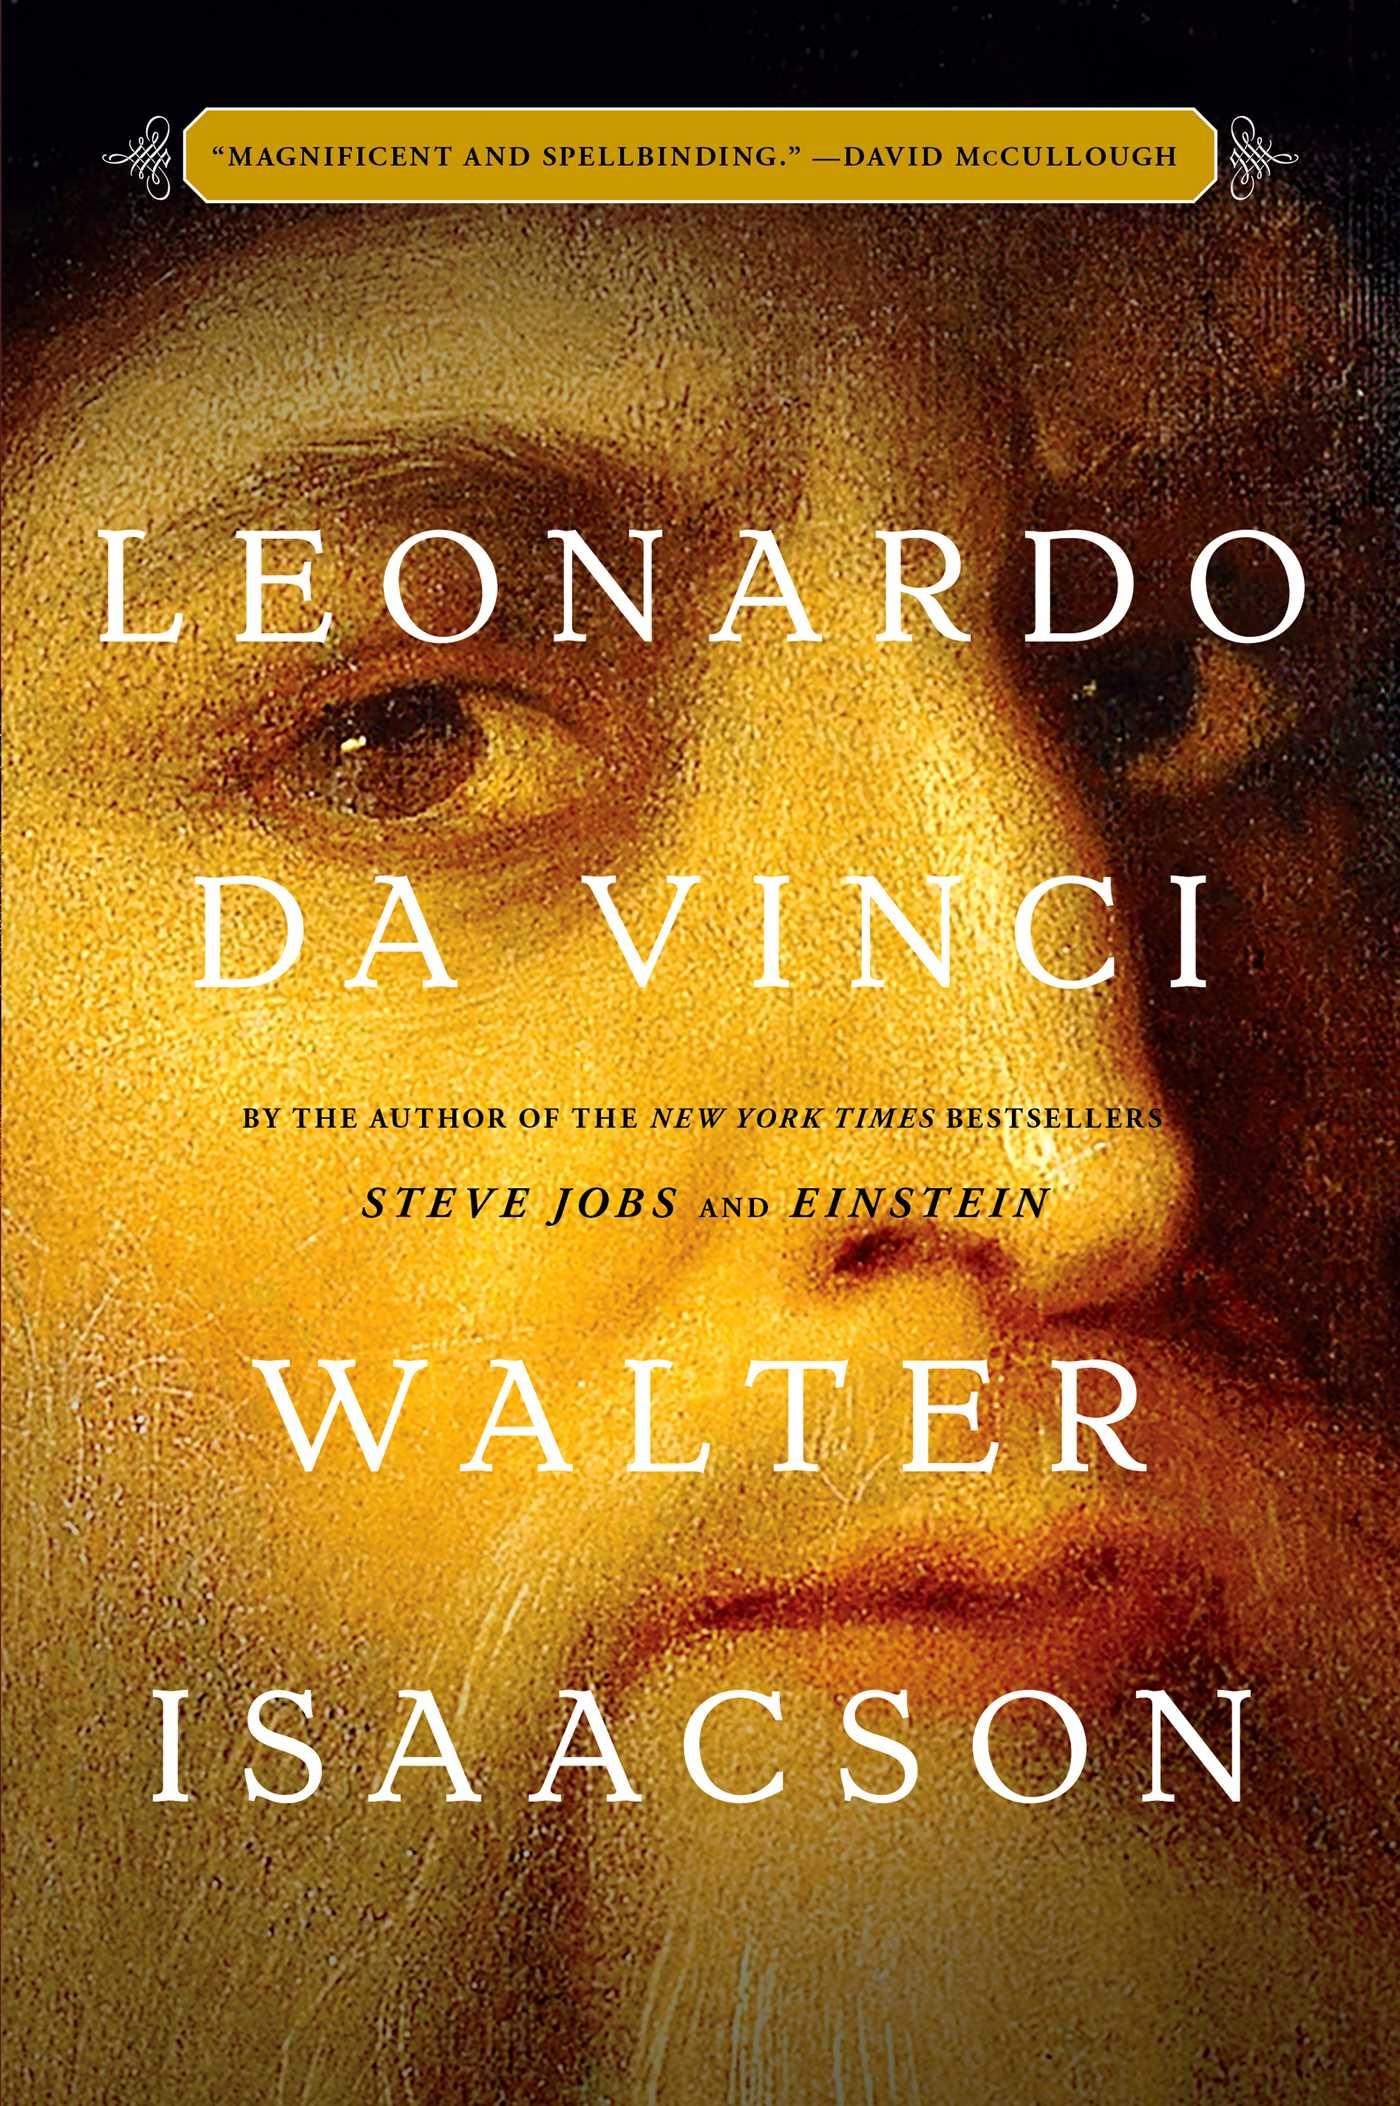 Leonardo da vinci book by walter isaacson official publisher leonardo da vinci book by walter isaacson official publisher page simon schuster fandeluxe Gallery